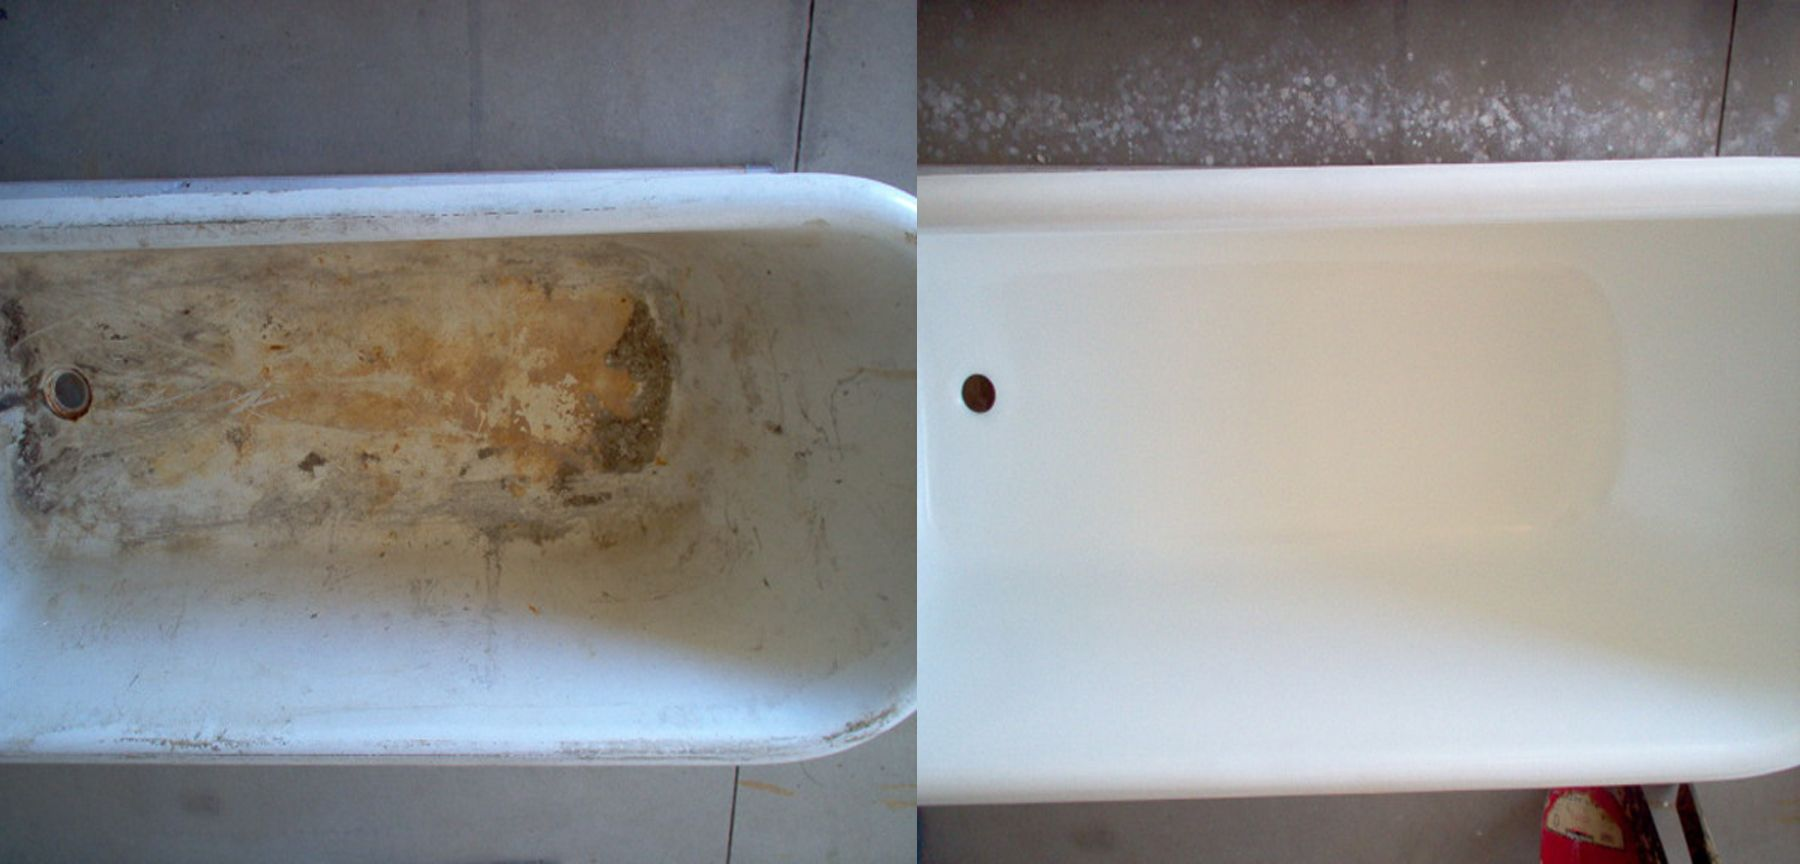 Cool Can U Paint A Bathtub Thin Can I Paint My Tub Flat Resurface Bathtub Cost Reglazing Bathtub Cost Youthful Cost To Reglaze Bathtub YellowGlazing Tubs Bathtub Repair Refinishing Phoenix, AZ Napco Certfication Low ..